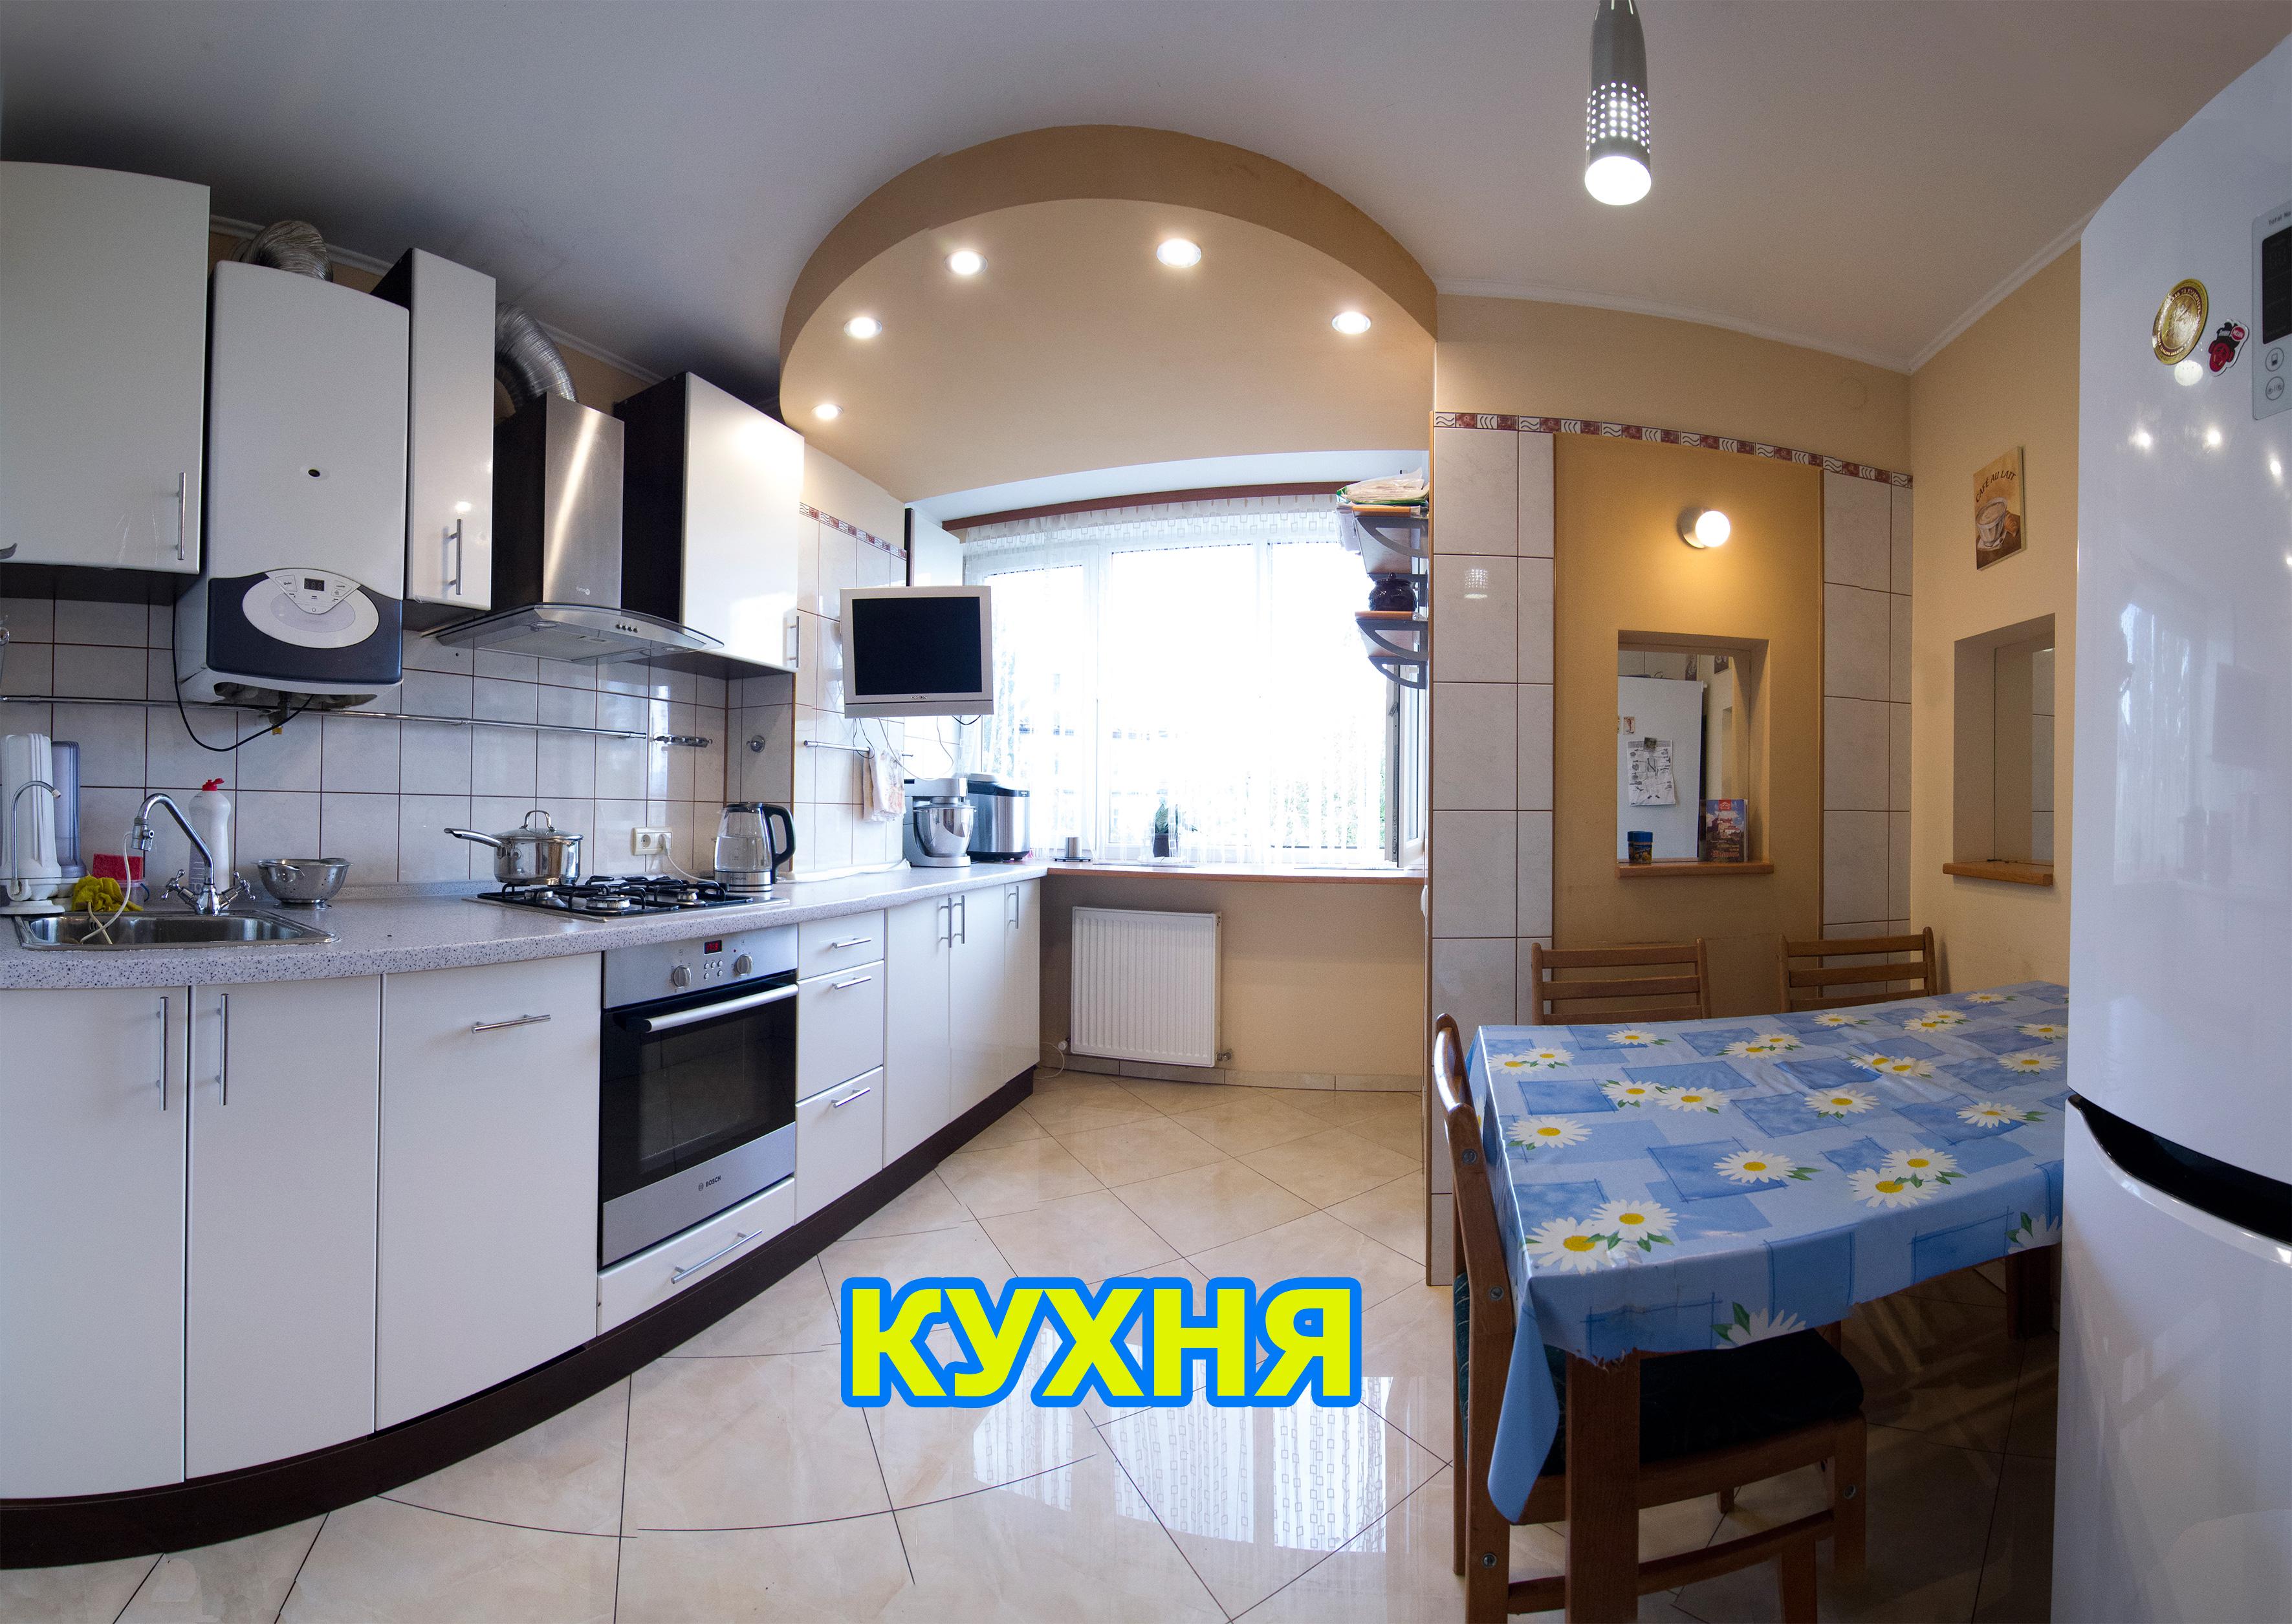 Обменяю 4-х комнатную квартиру в Мукачево на дом в Мукачево